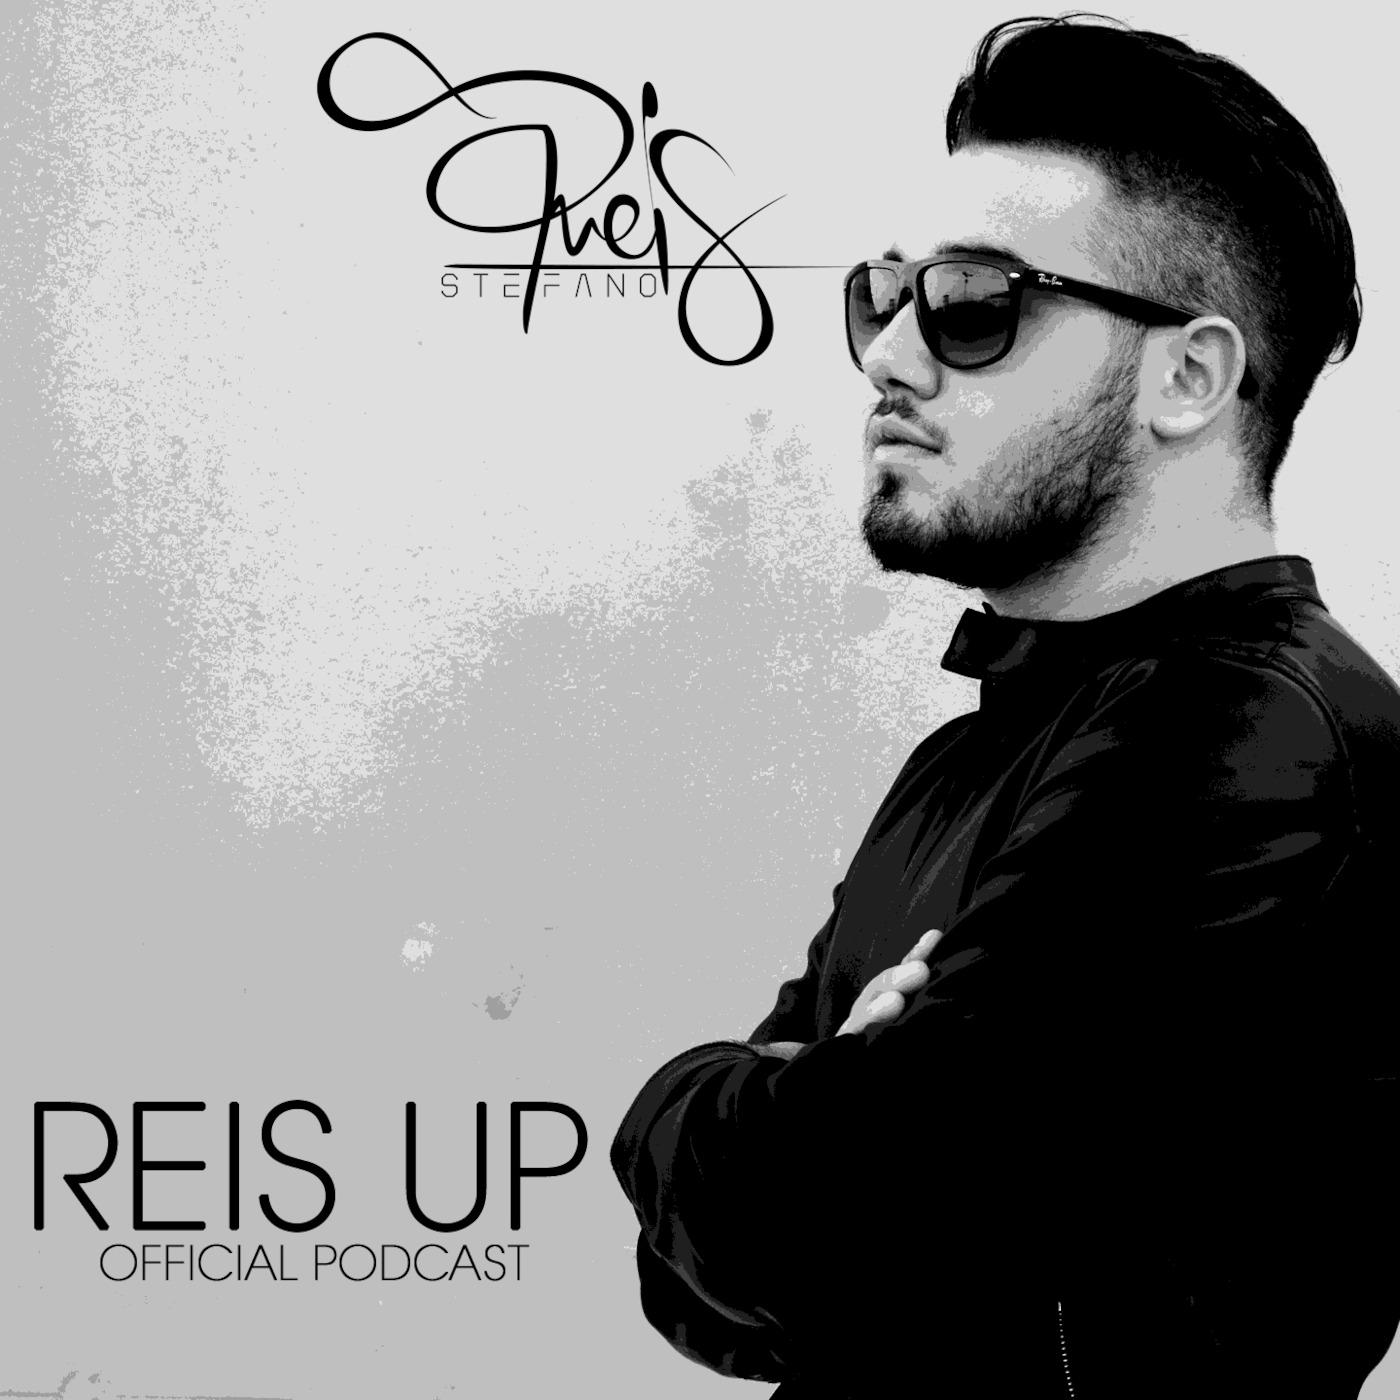 Stefano Reis' Podcast